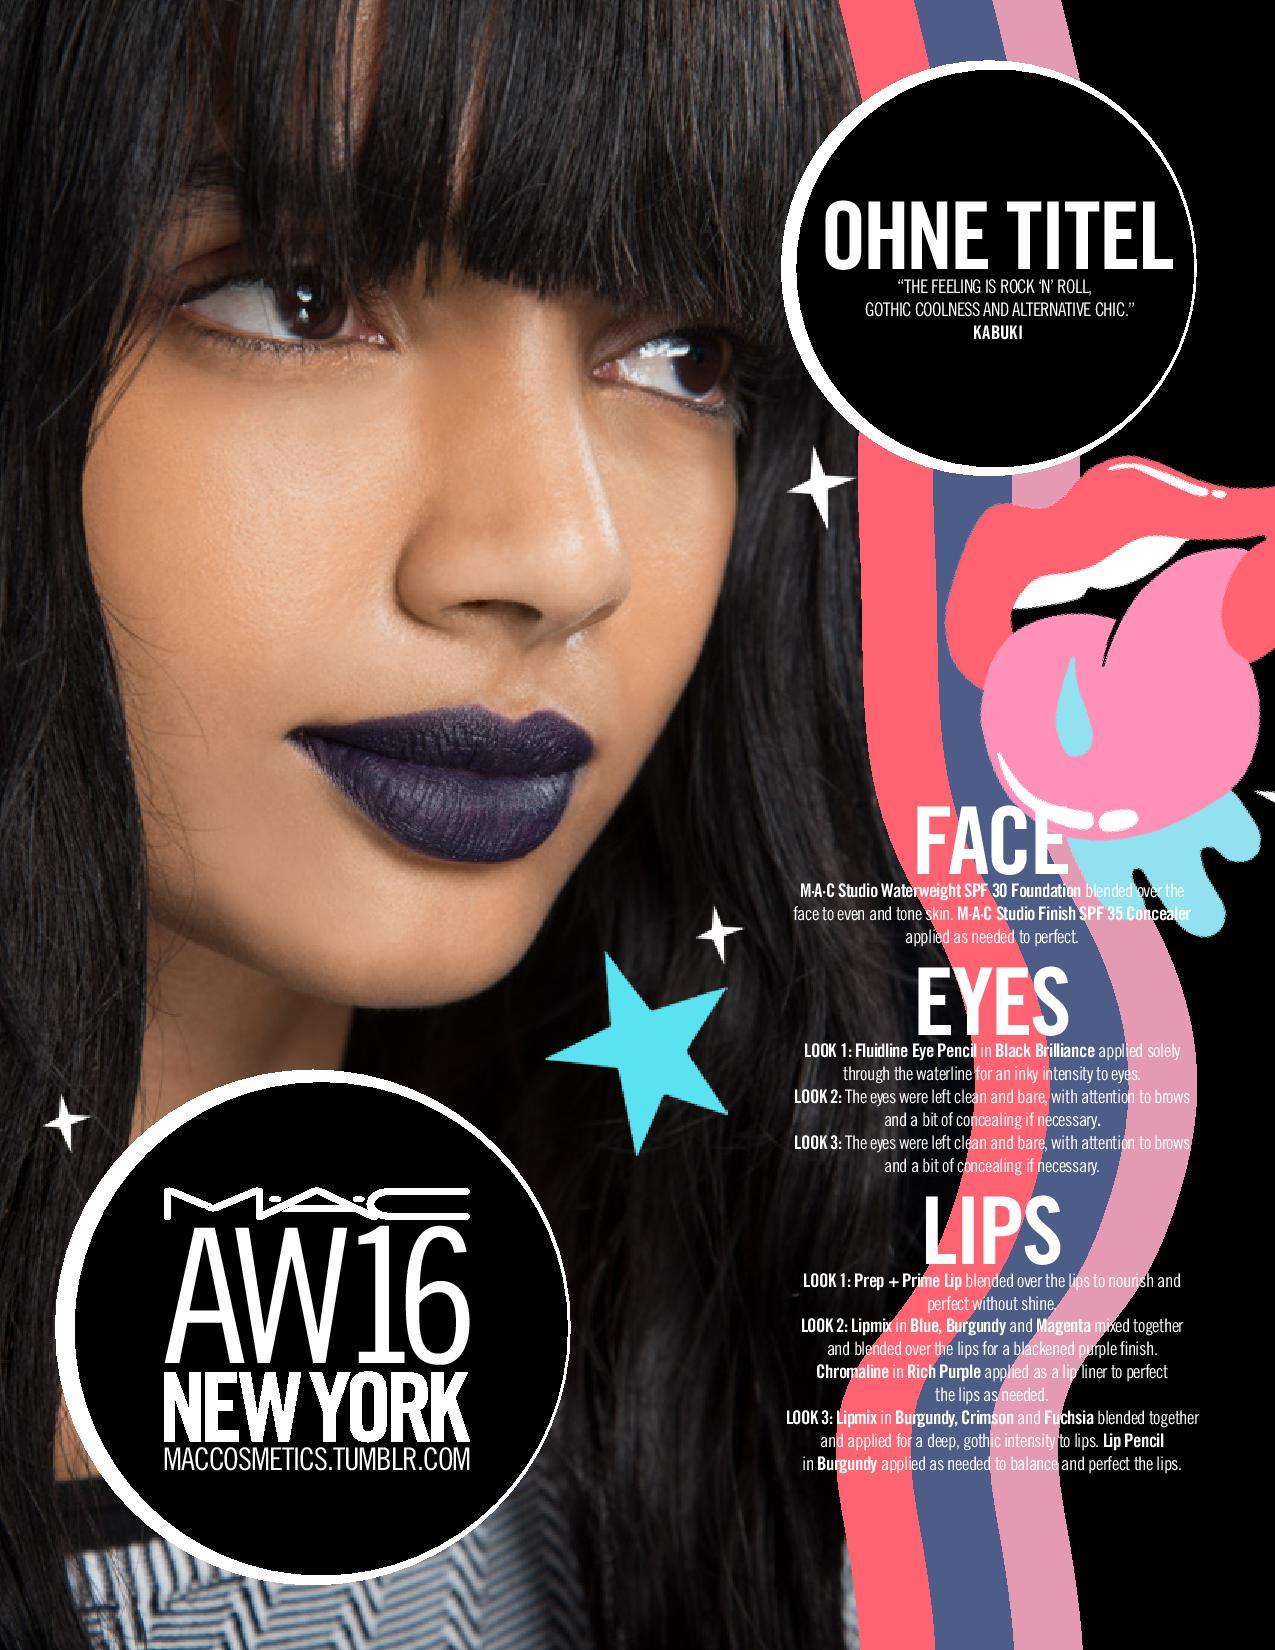 AW16_DAILY FACECHART_NEW YORK_FEB 16 (Ohne Titel, Oscar de la Renta)-page-002